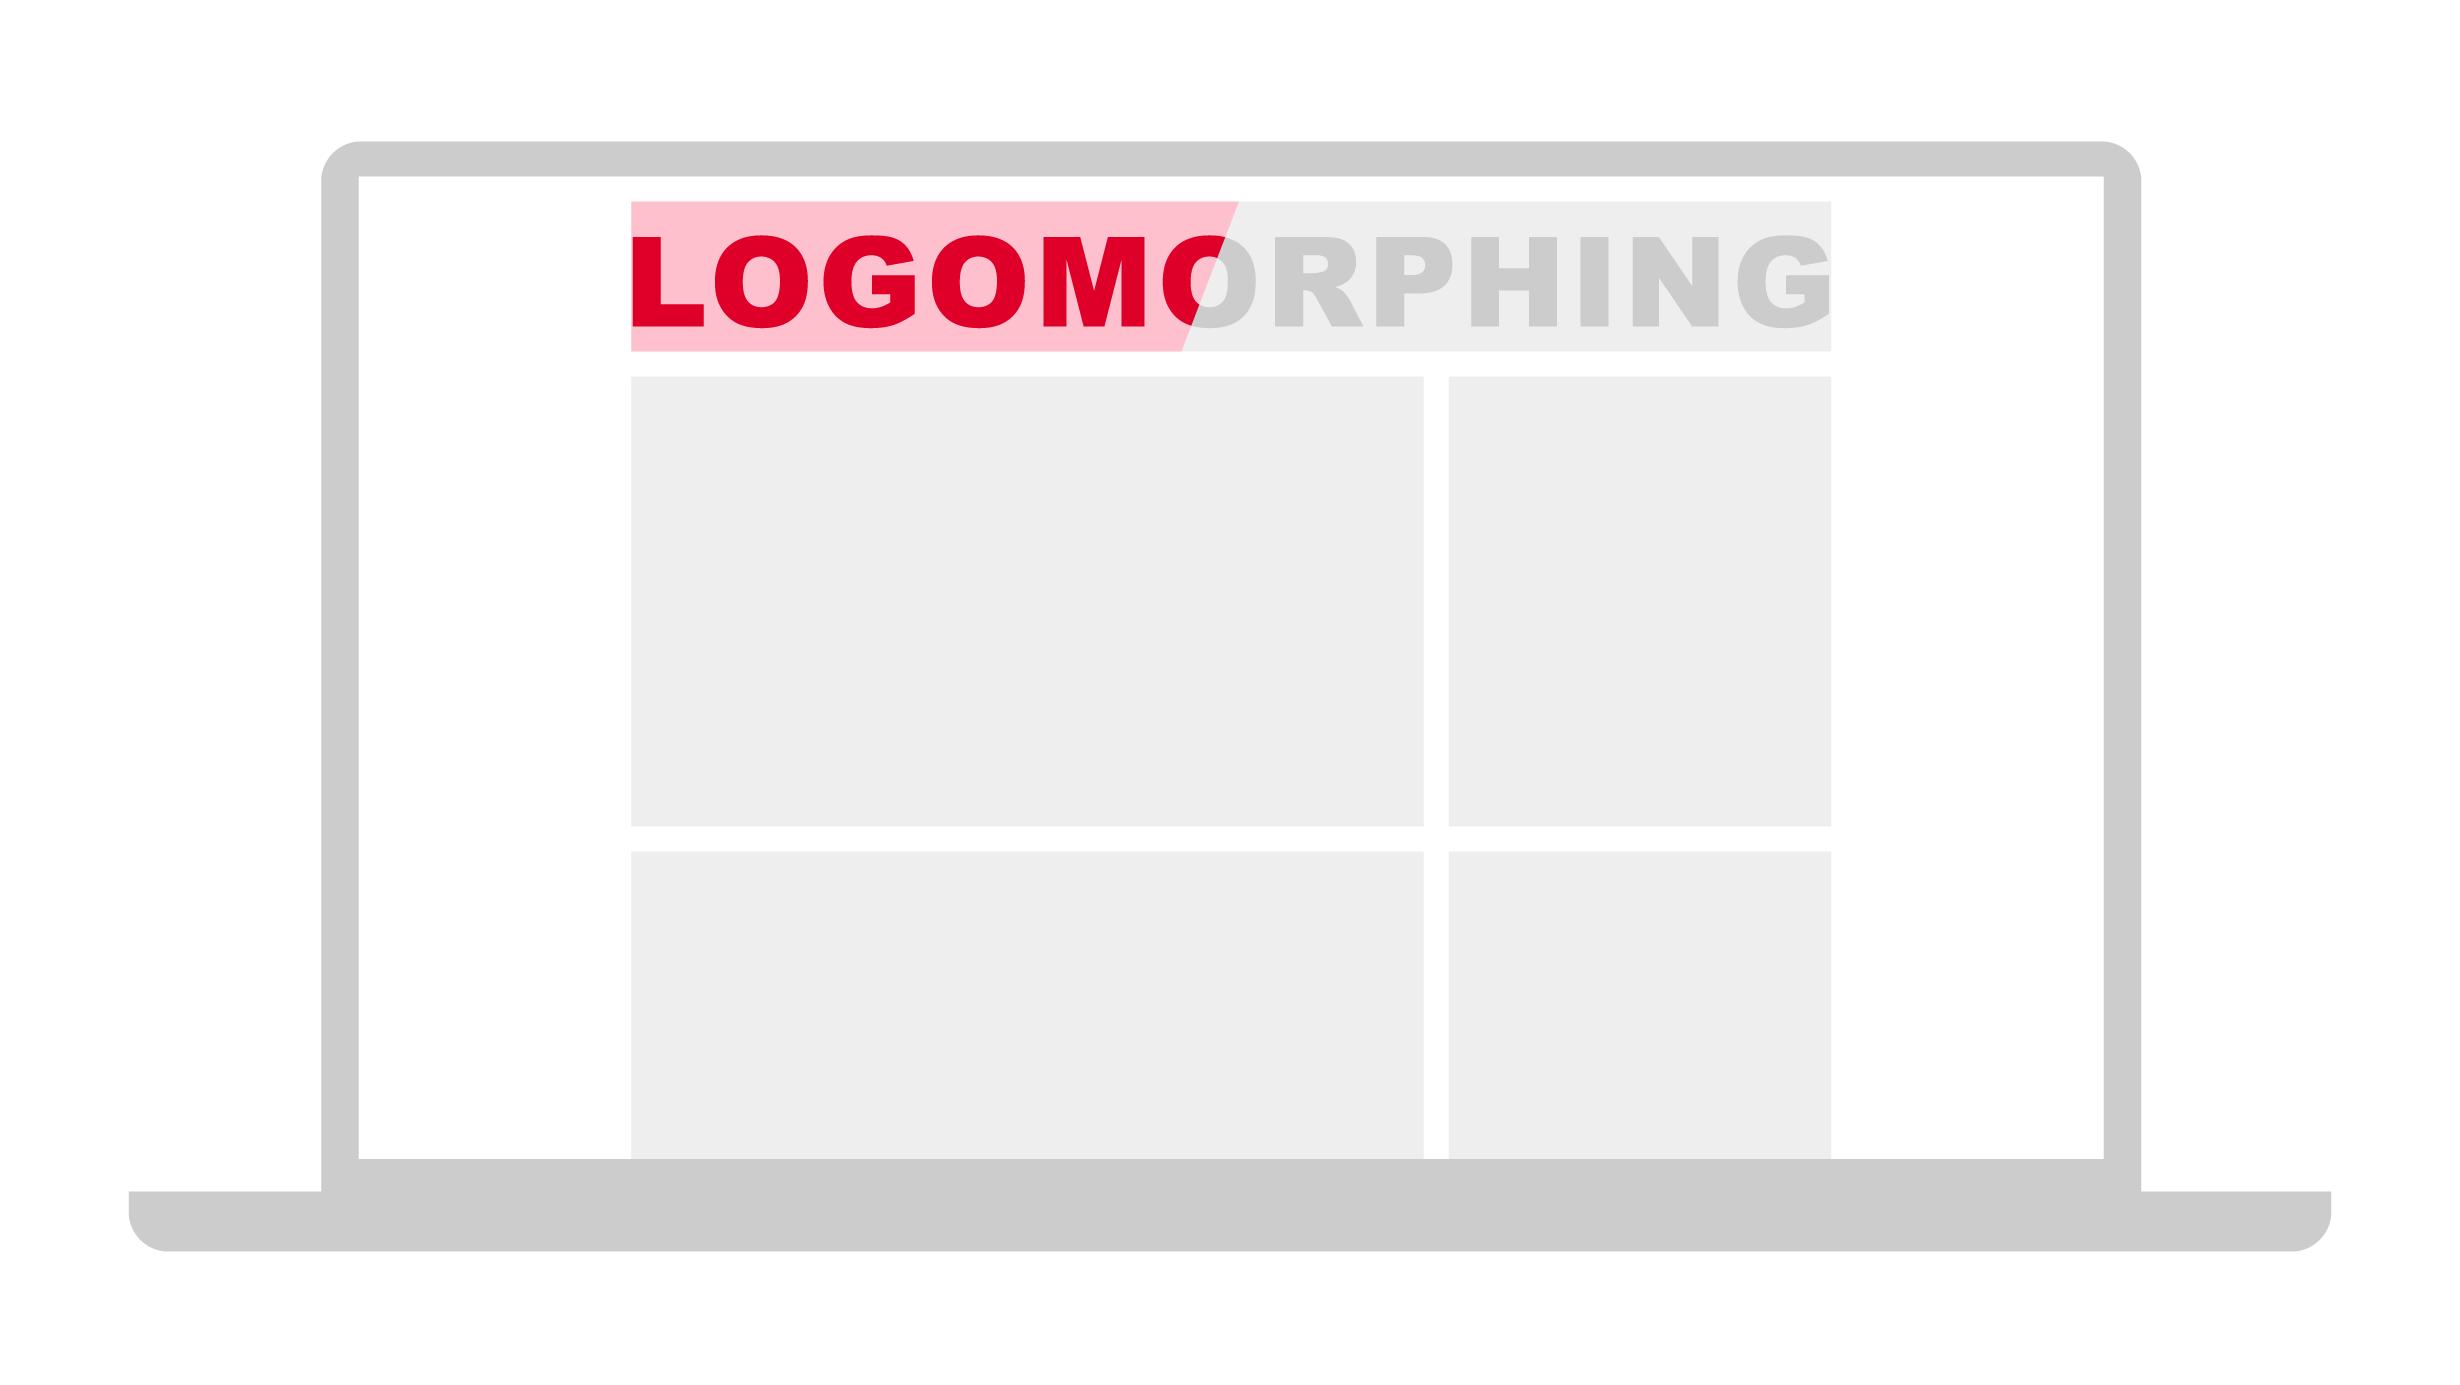 Logomorphing